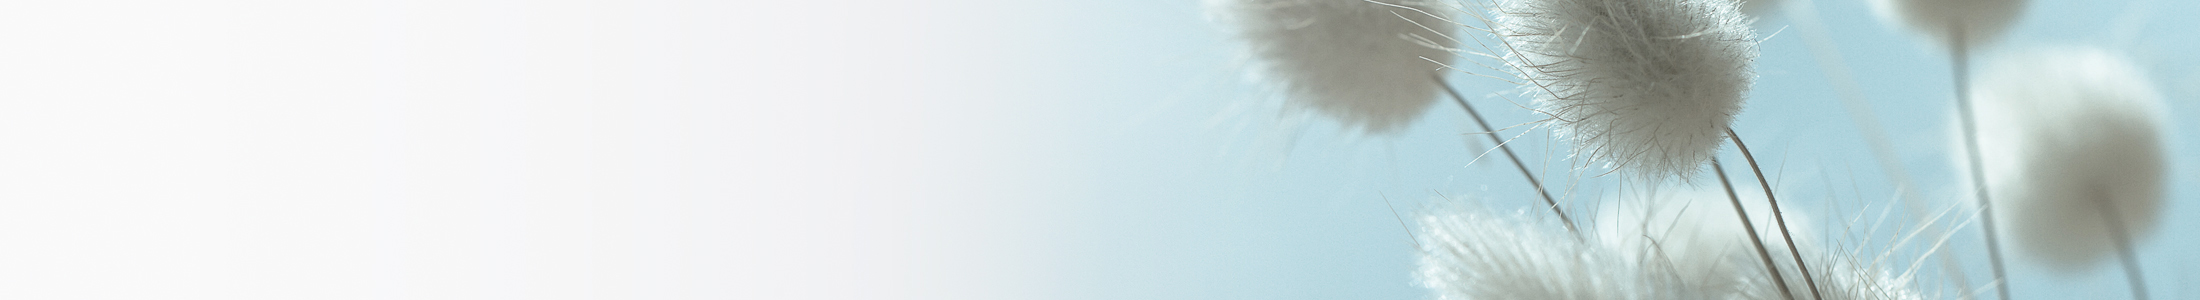 header-huidkliniekellis-pagedetail.jpg